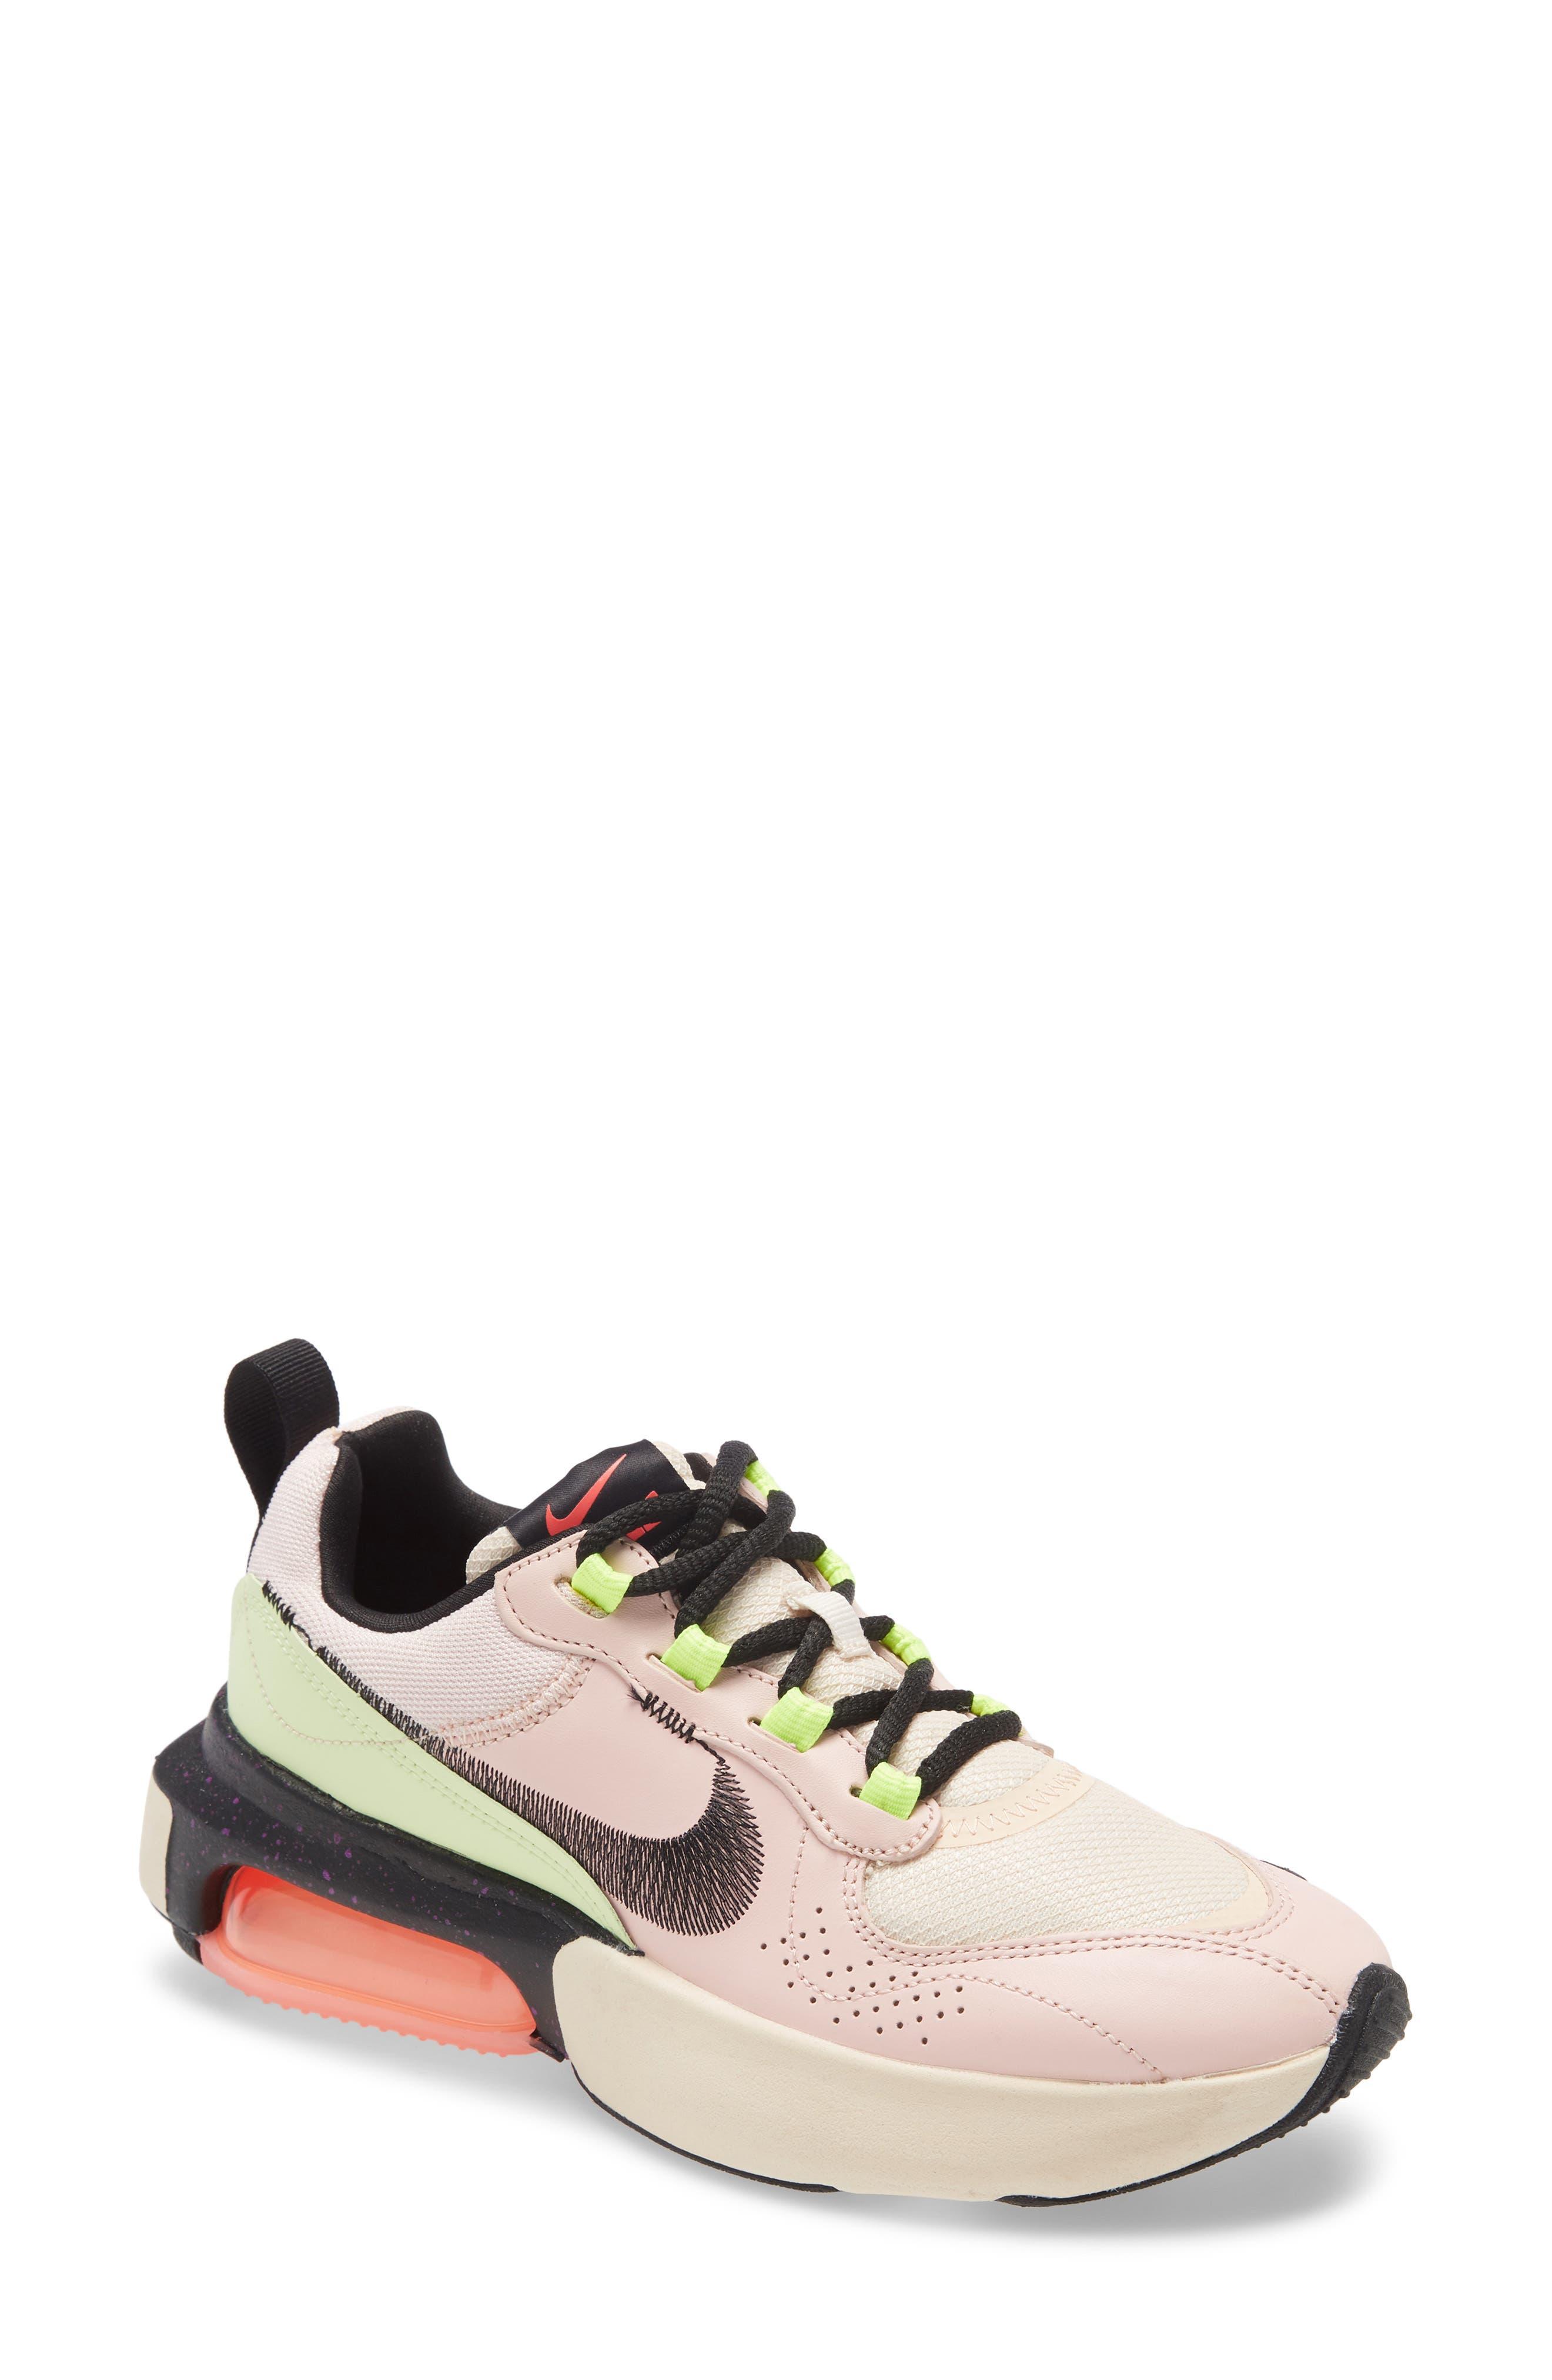 Nike Air Max Verona QS Sneaker (Women